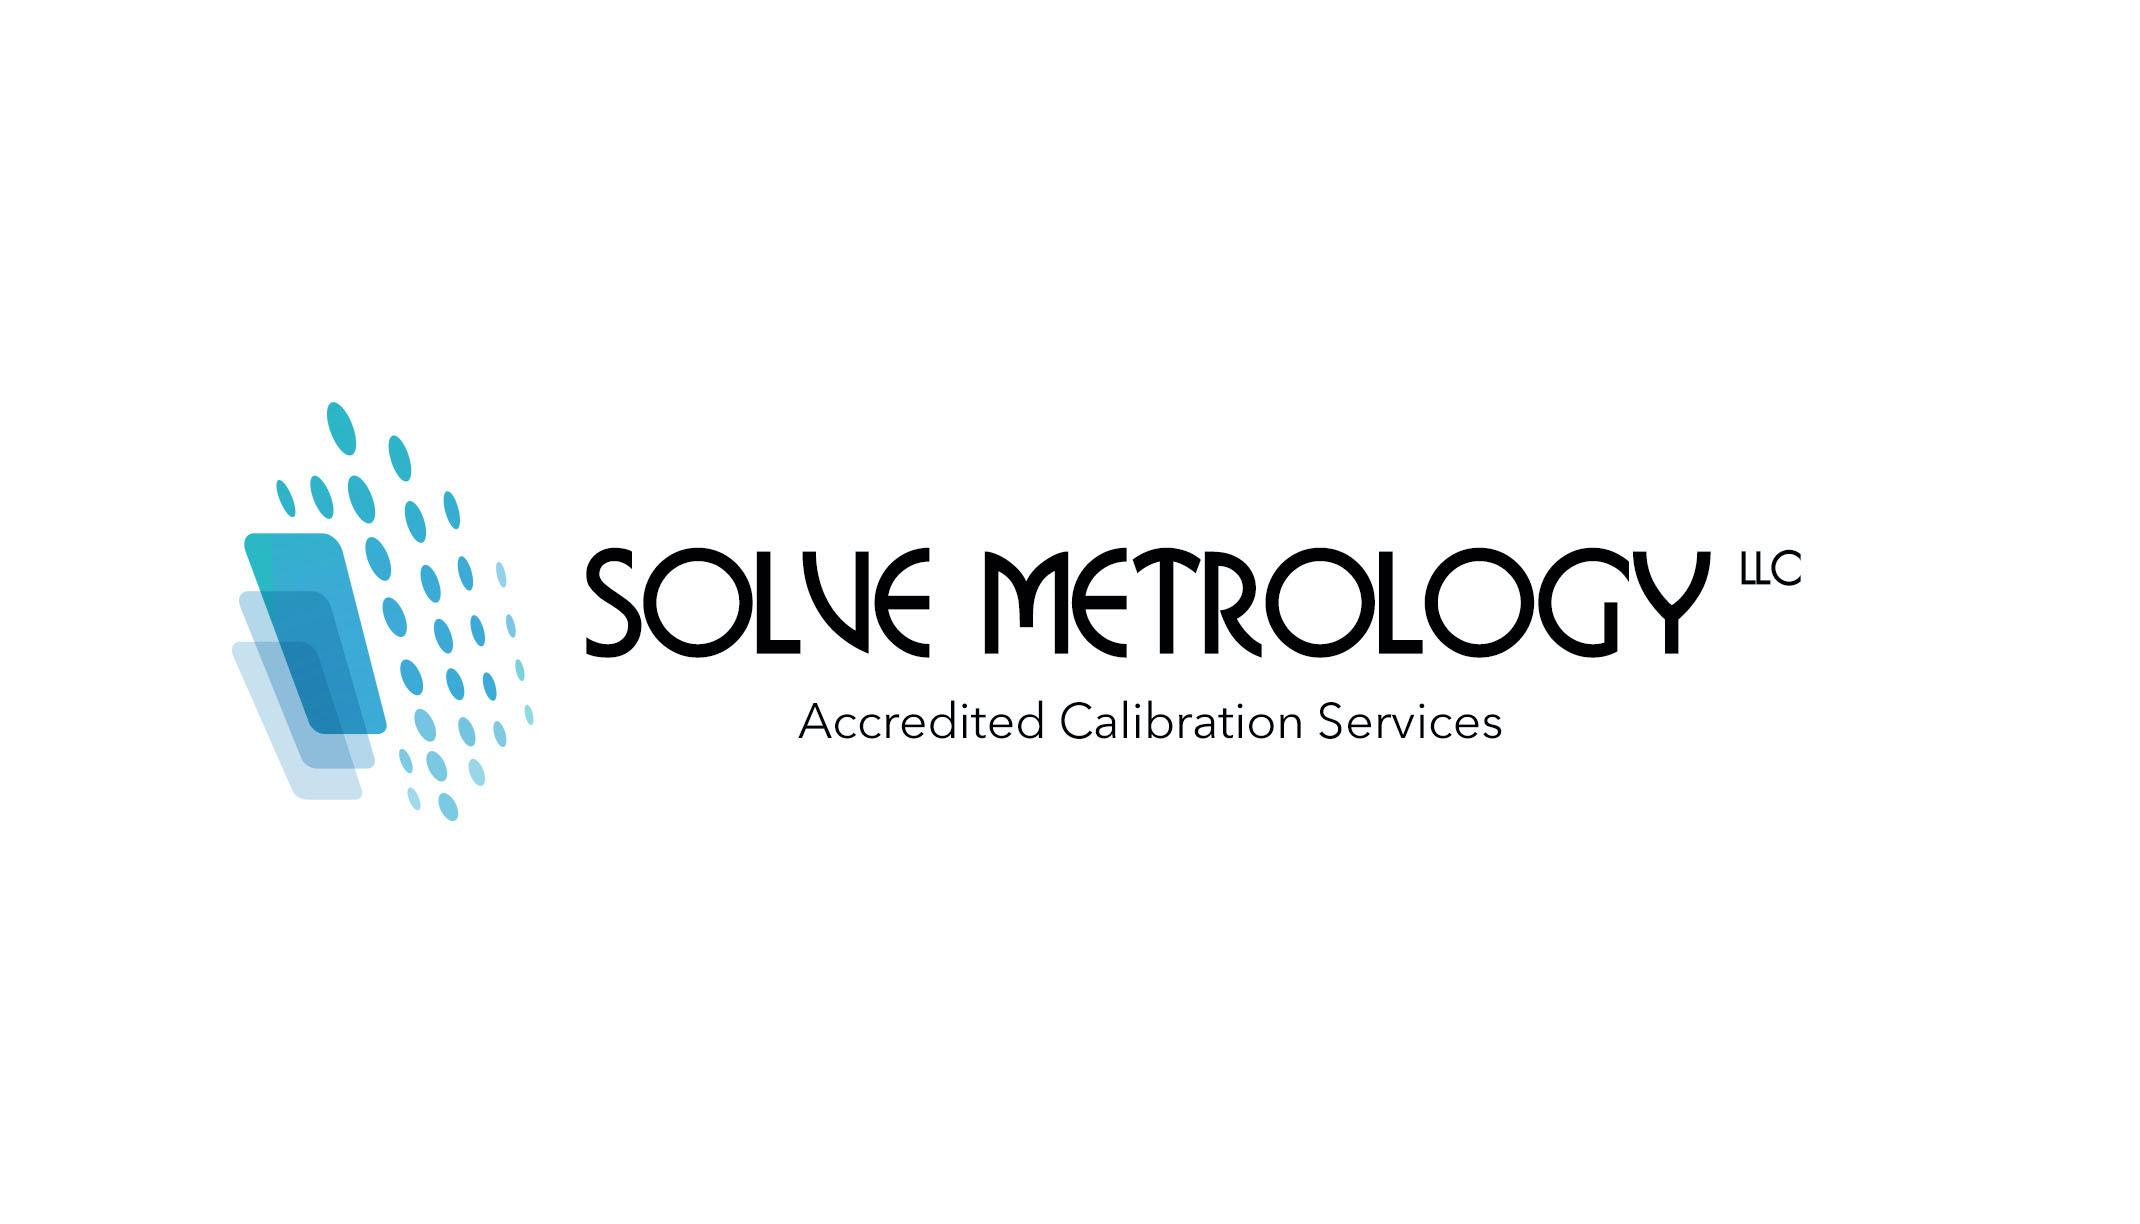 Solve Metrology